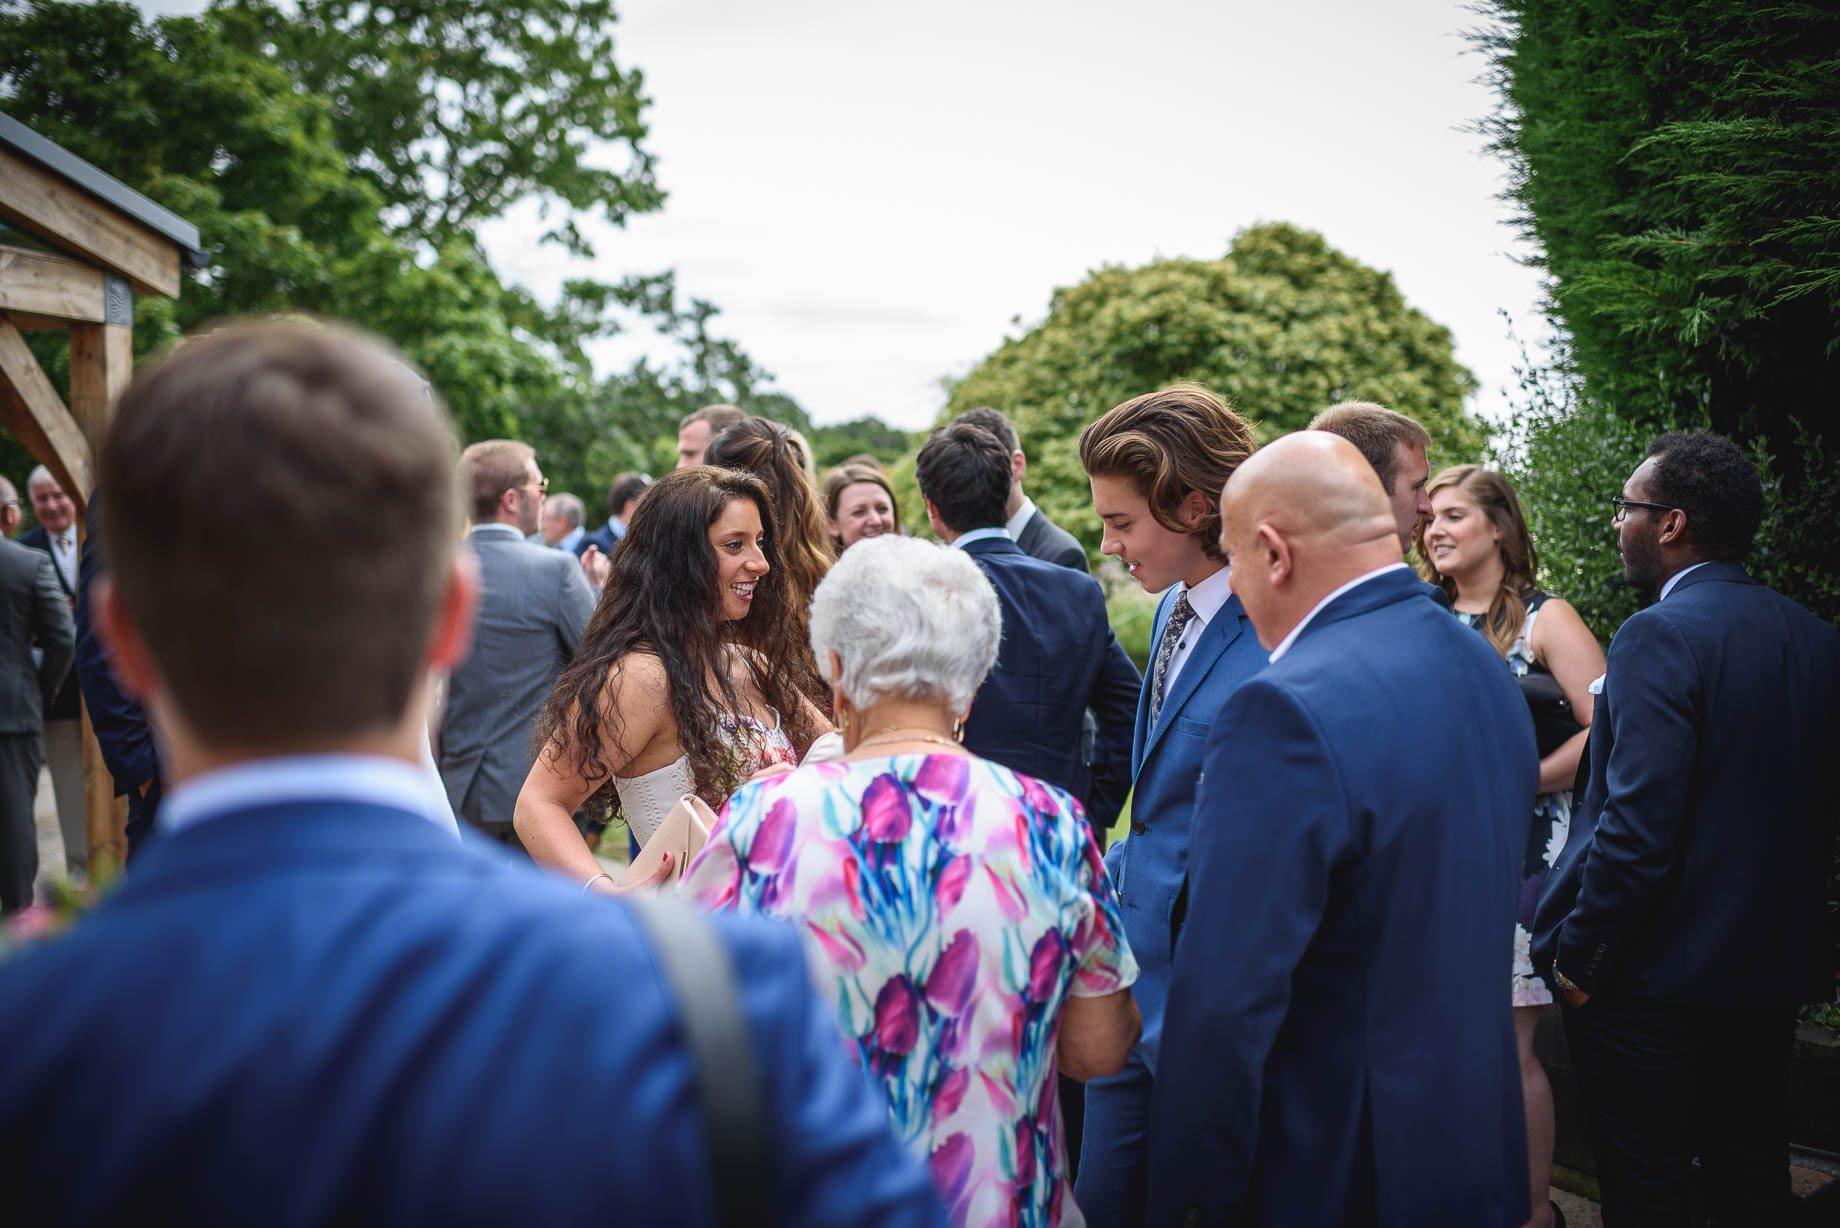 Gaynes Park wedding photography - Guy Collier Photography - Rachel and Jon (45 of 169)